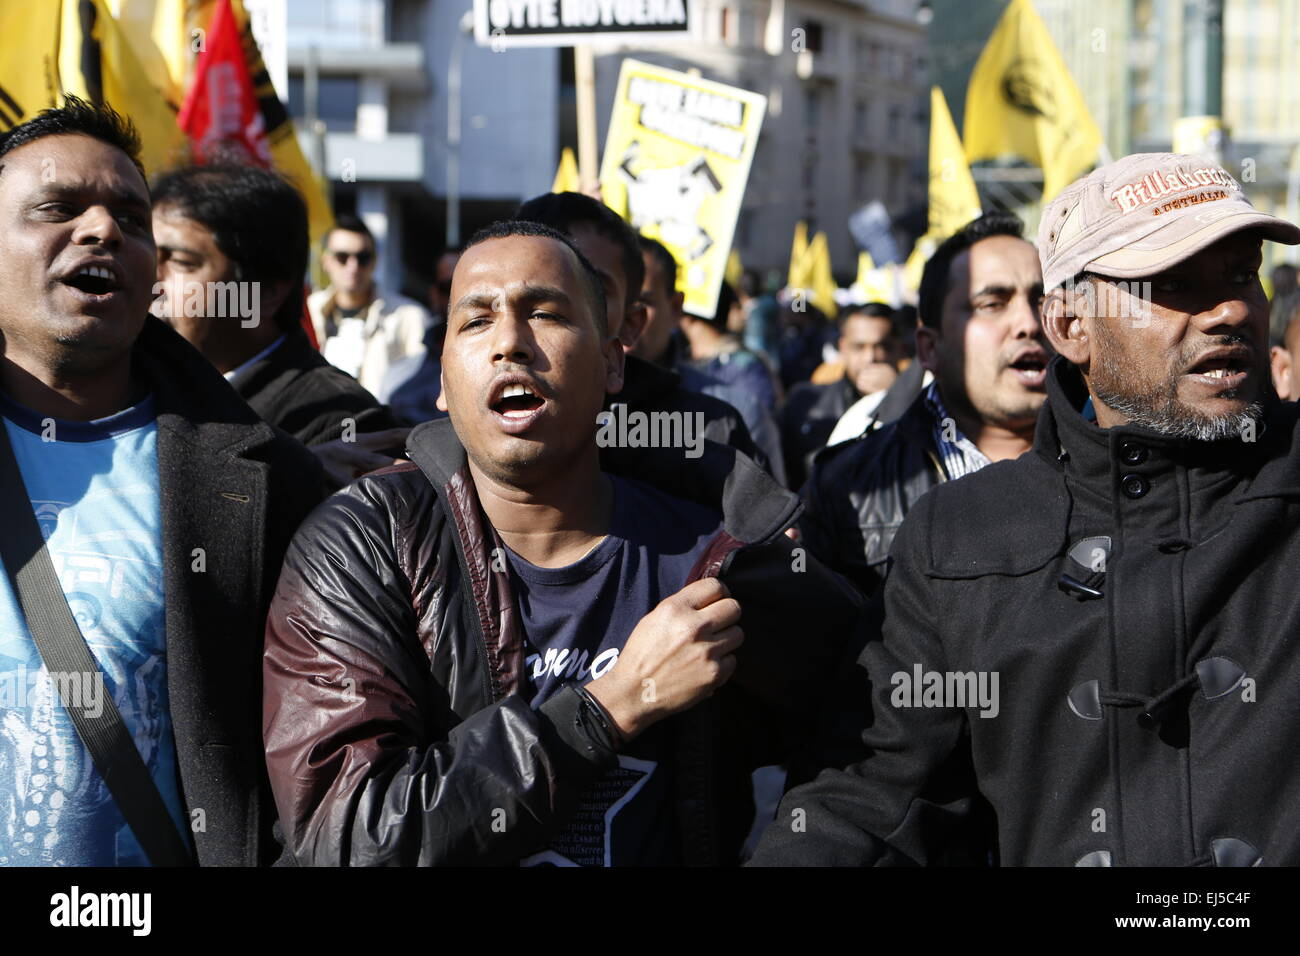 Athens, Greece. 21st Mar, 2015. An immigrant shouts anti-rasist slogans. ANTARSYA (Anticapitalist Left Cooperation - Stock Image